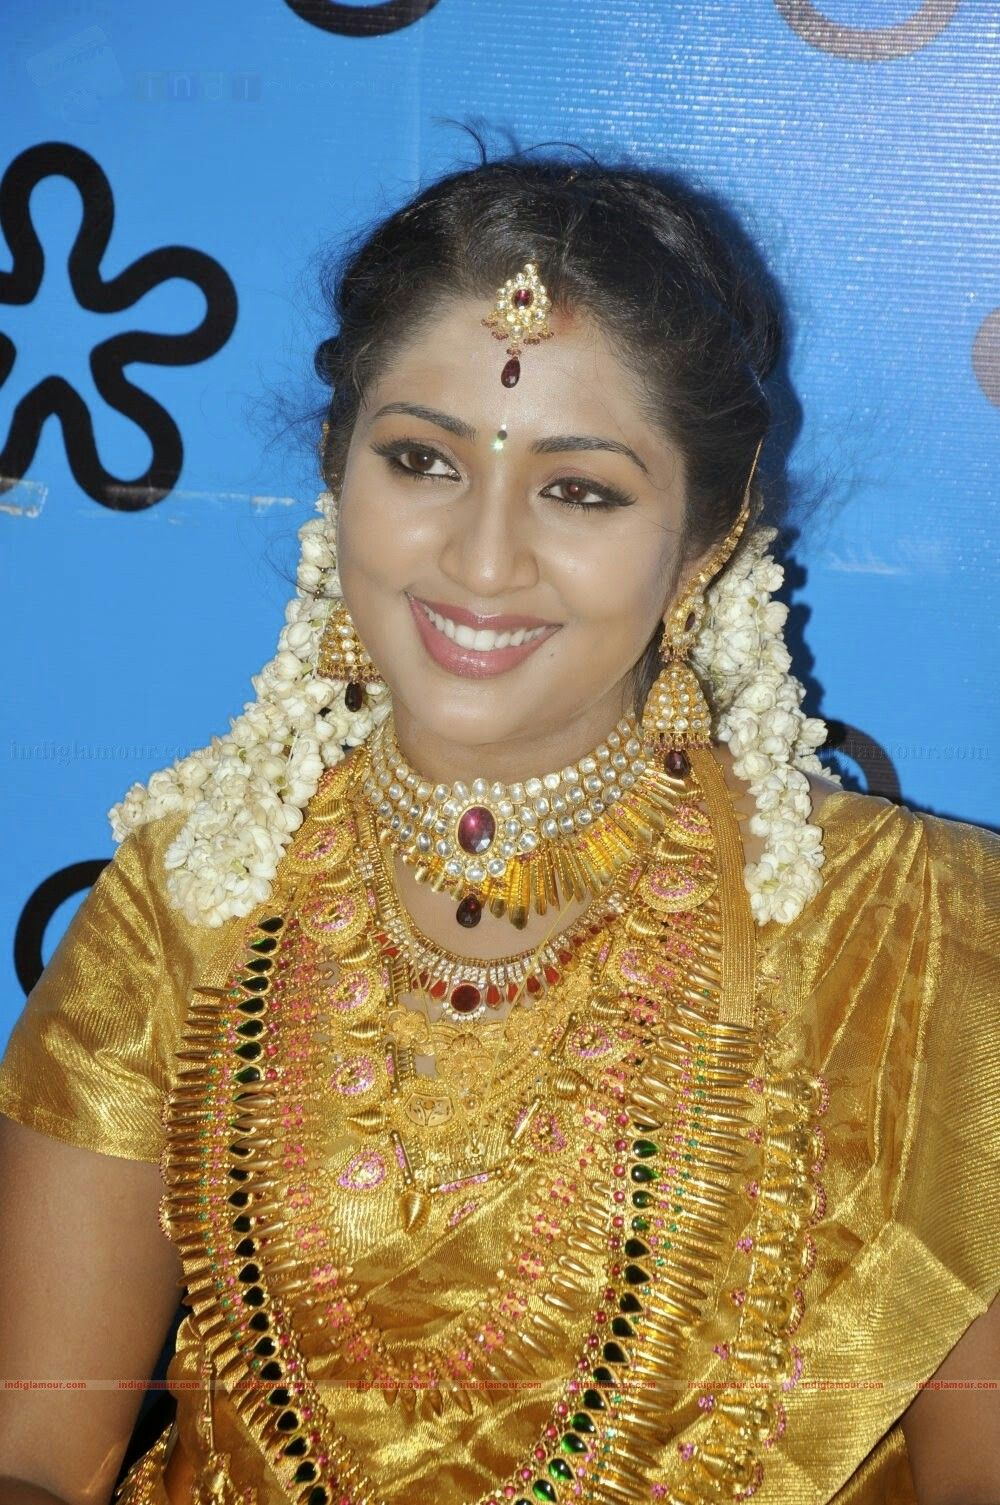 pin by joker fashion's on kerala wedding makeup | pinterest